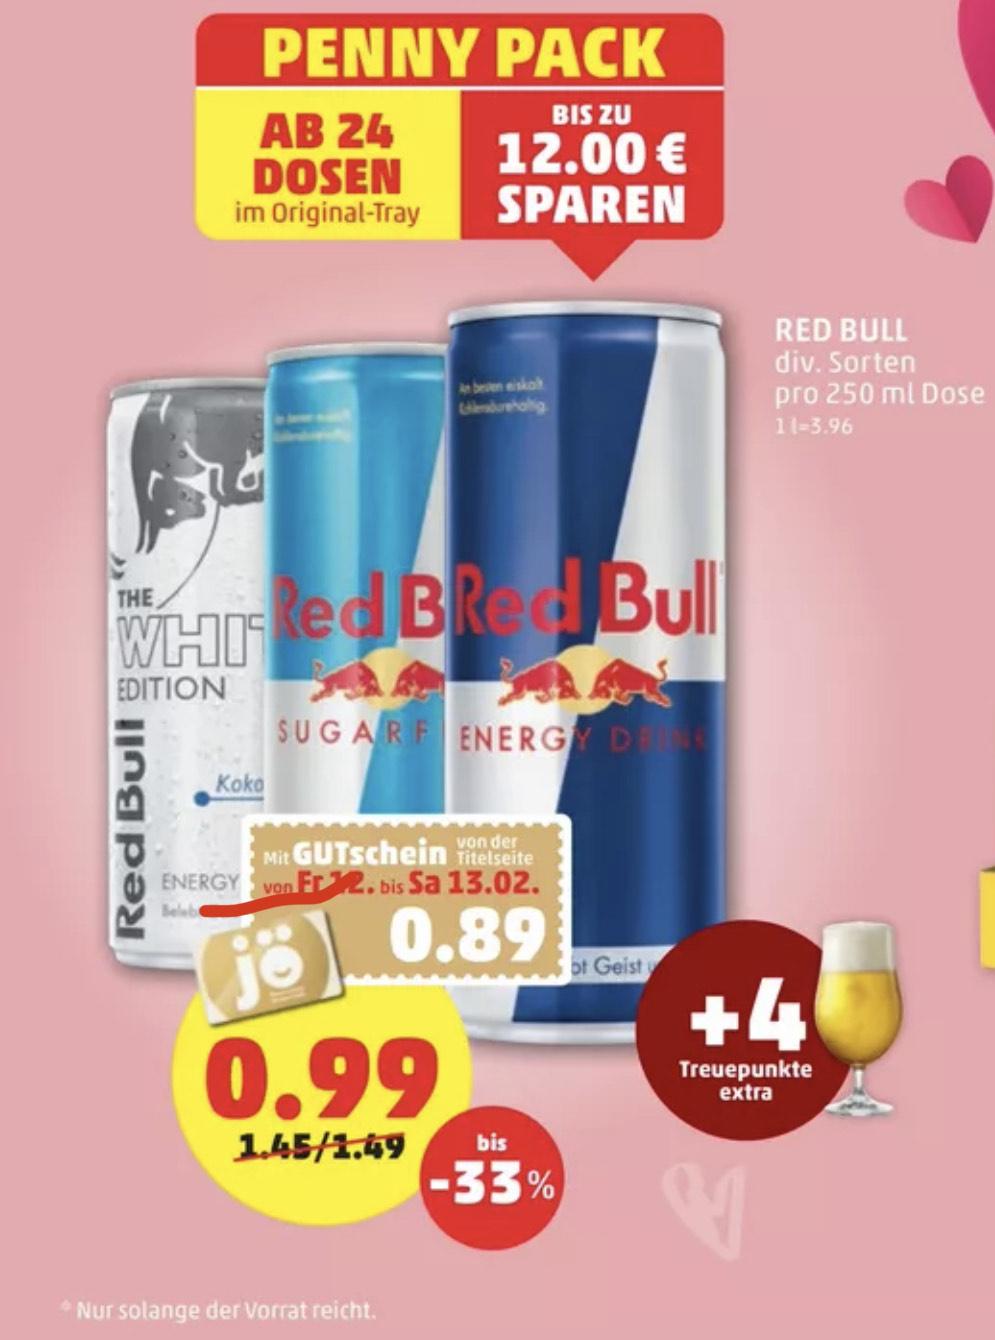 Penny - Red Bull für 0,89€ pro Dose ab 24Stk.